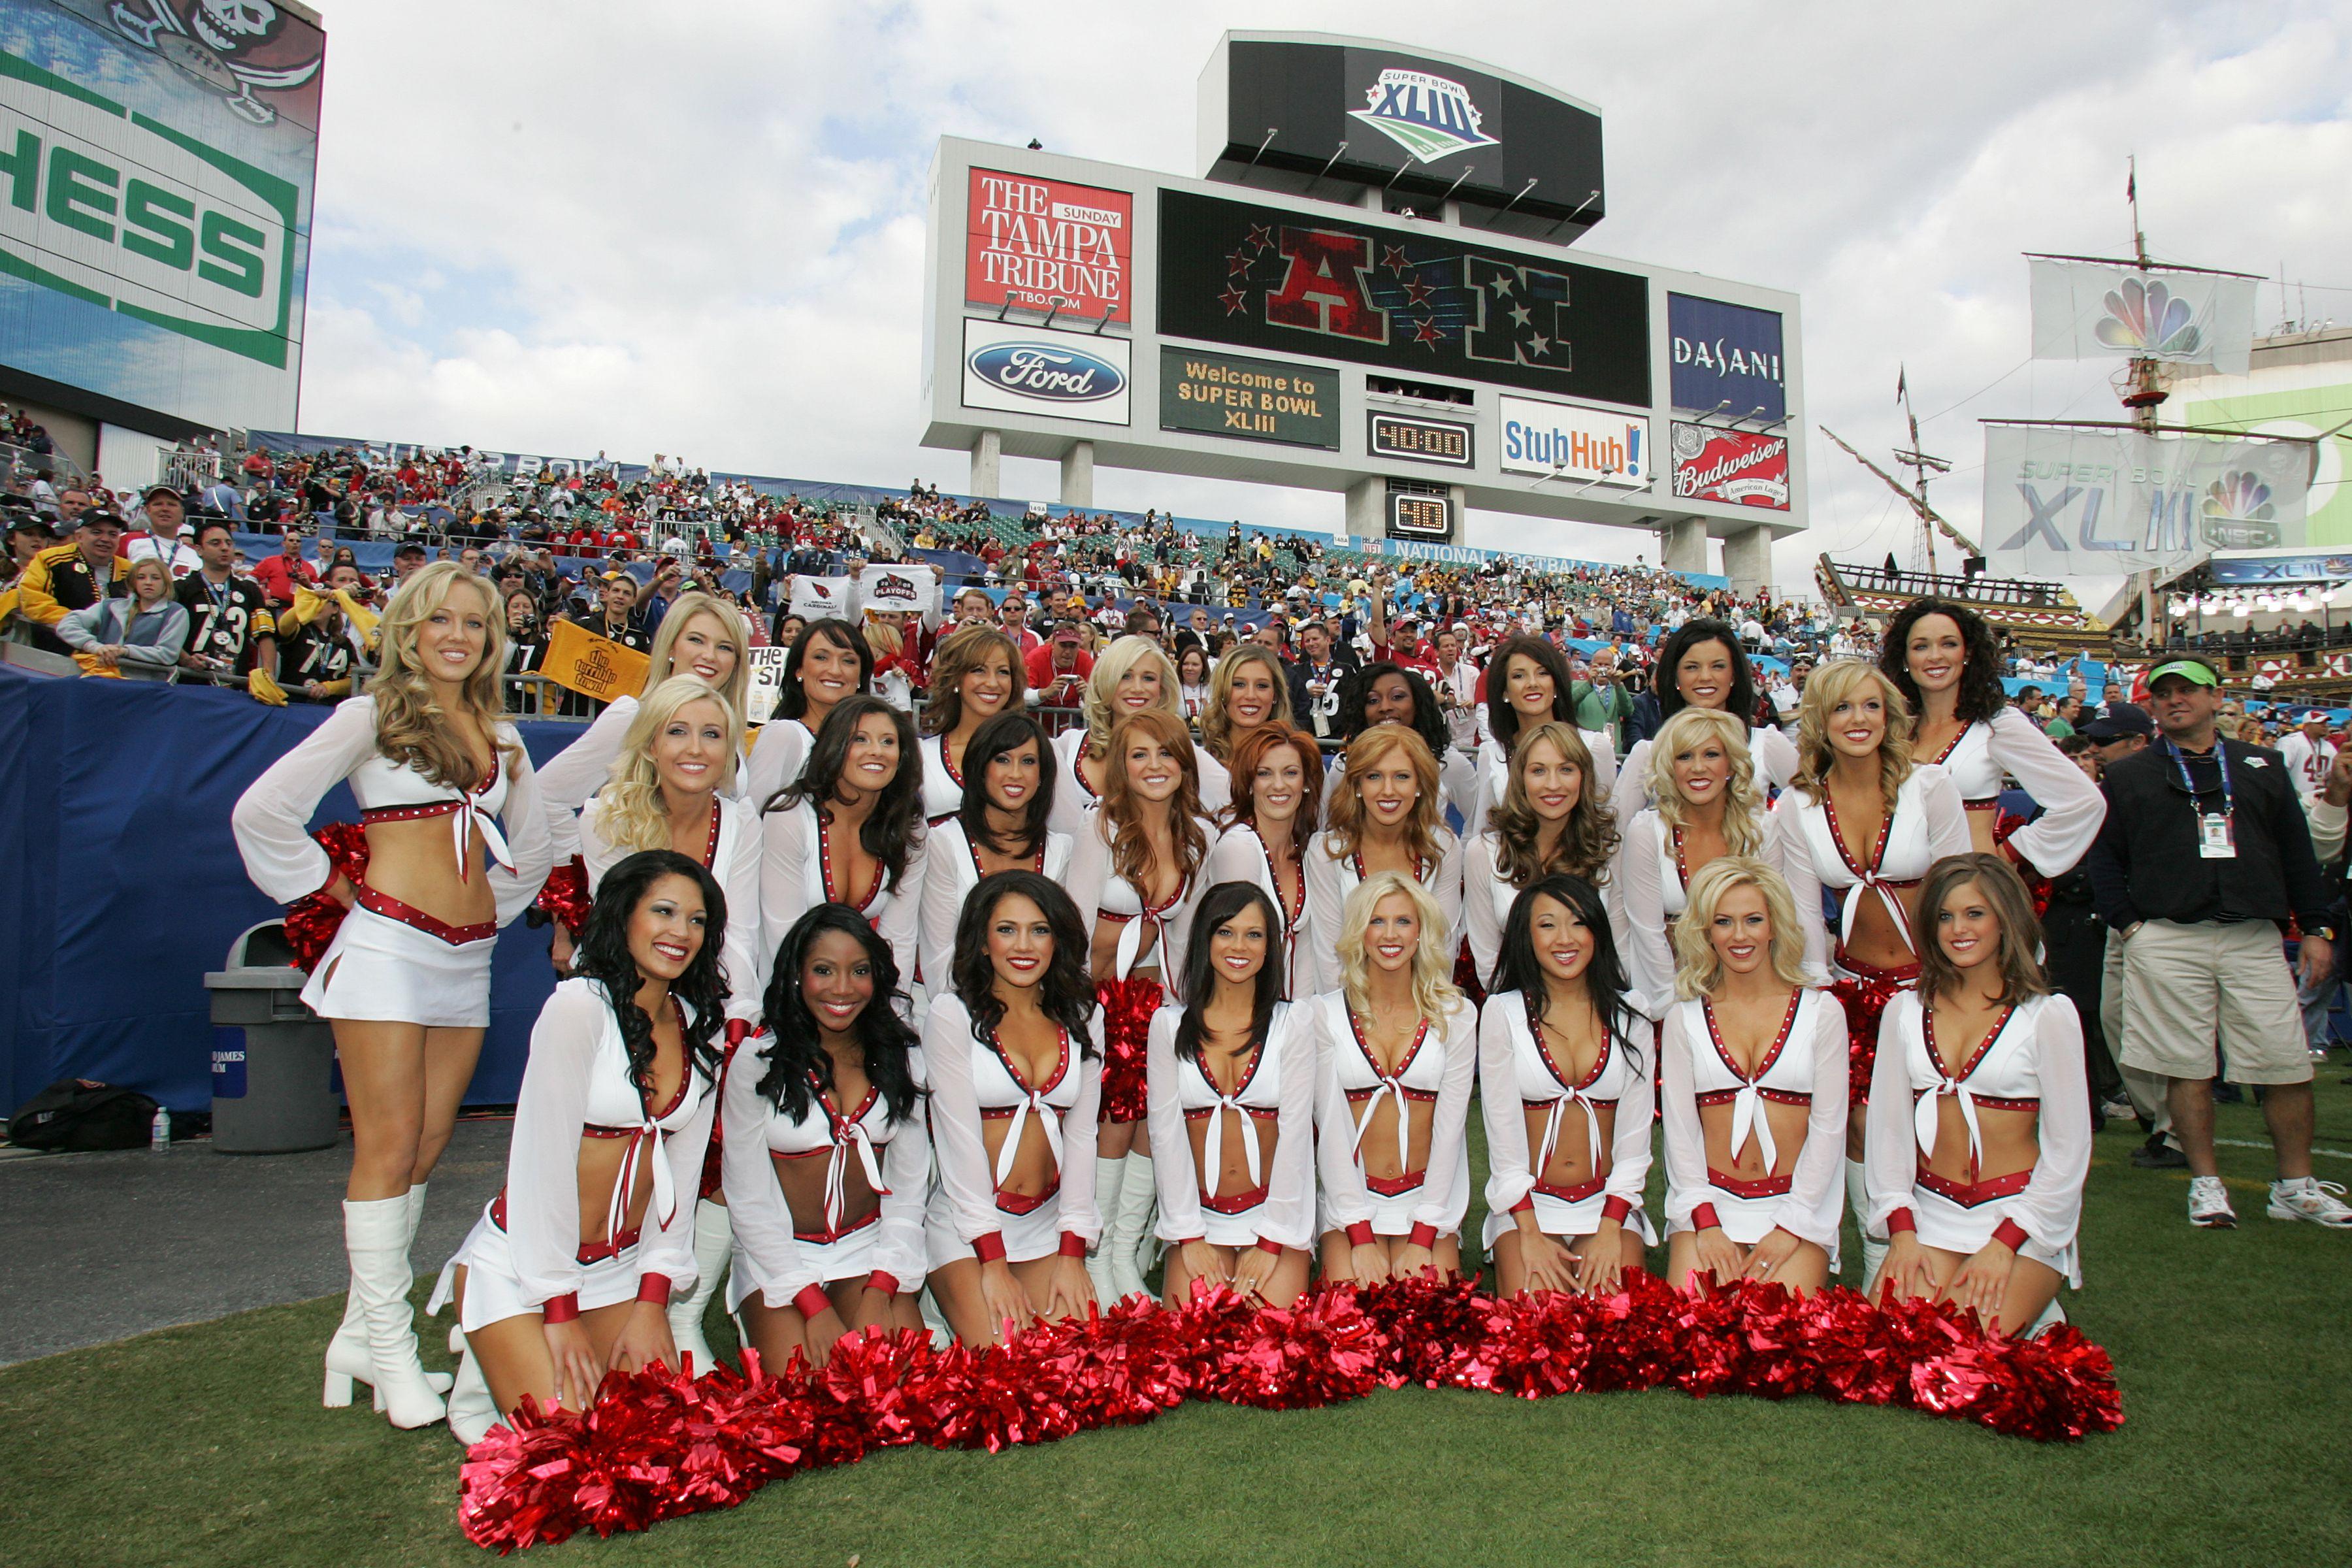 Throwback To The Arizona Cardinals Cheerleaders At Super Bowl Xliii Azcc Azcard Professional Cheerleaders Arizona Cardinals Cheerleaders Football Cheerleaders